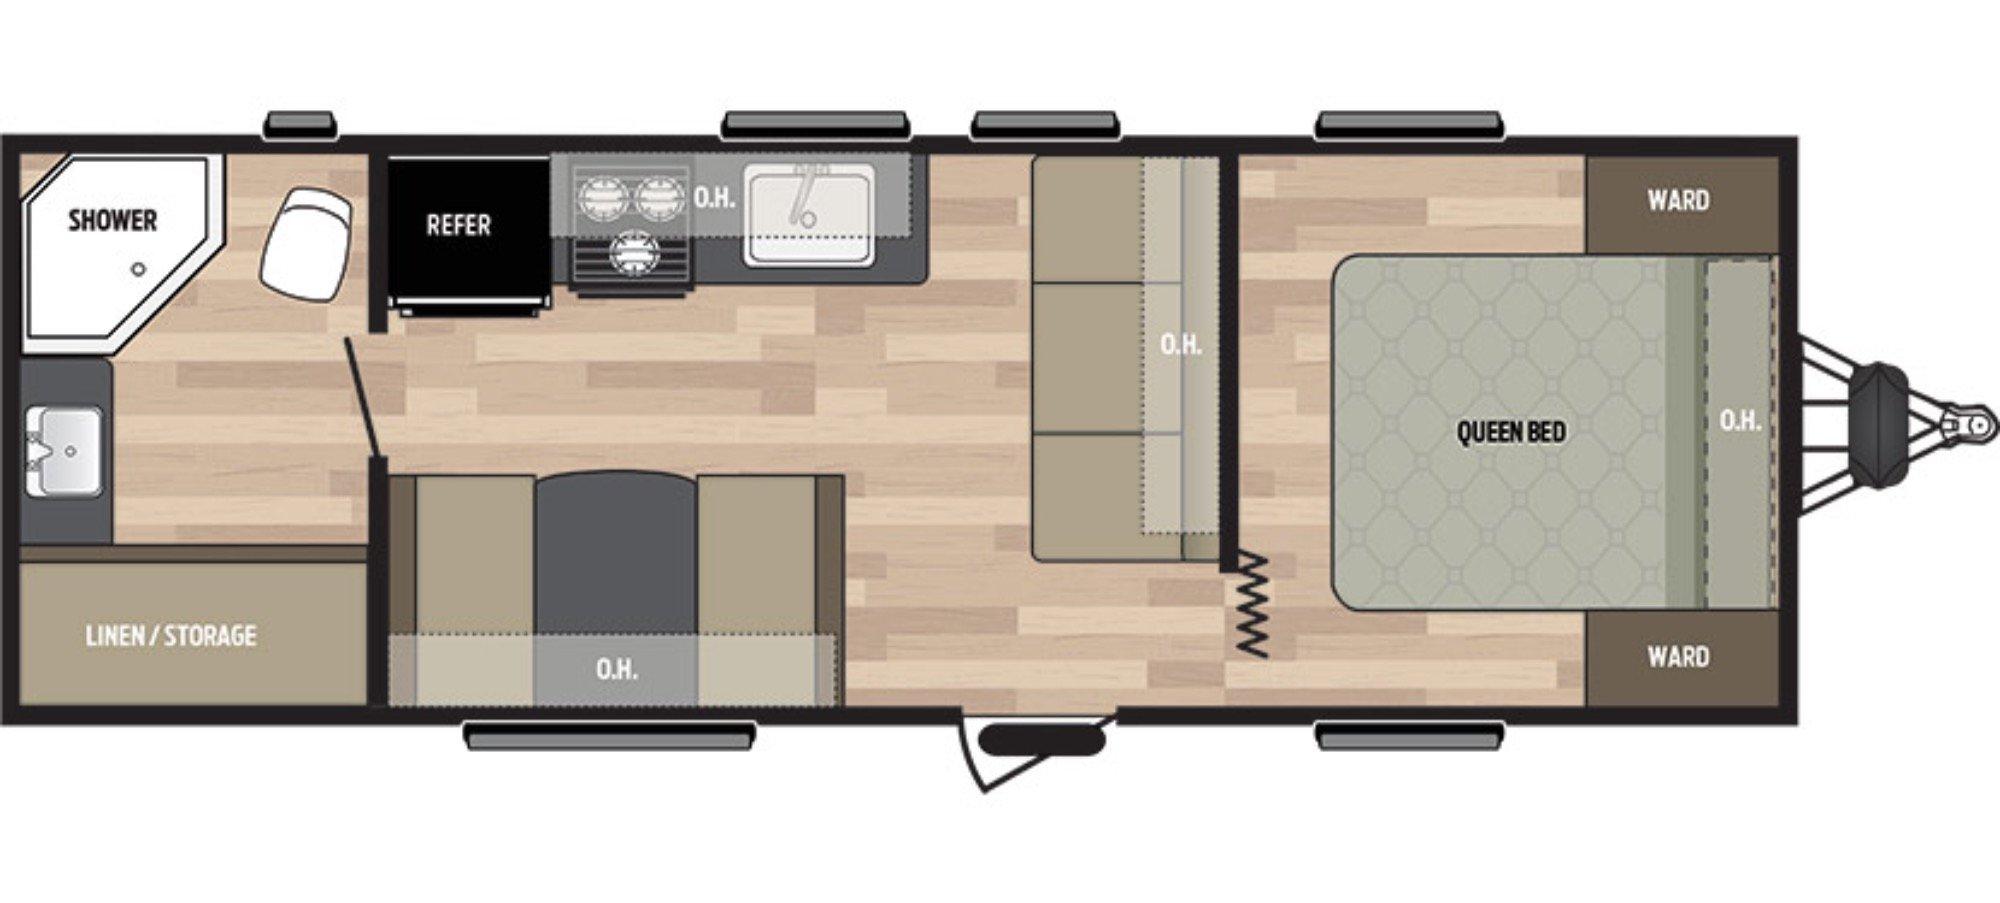 View Floor Plan for 2017 KEYSTONE SUMMERLAND 2450RB